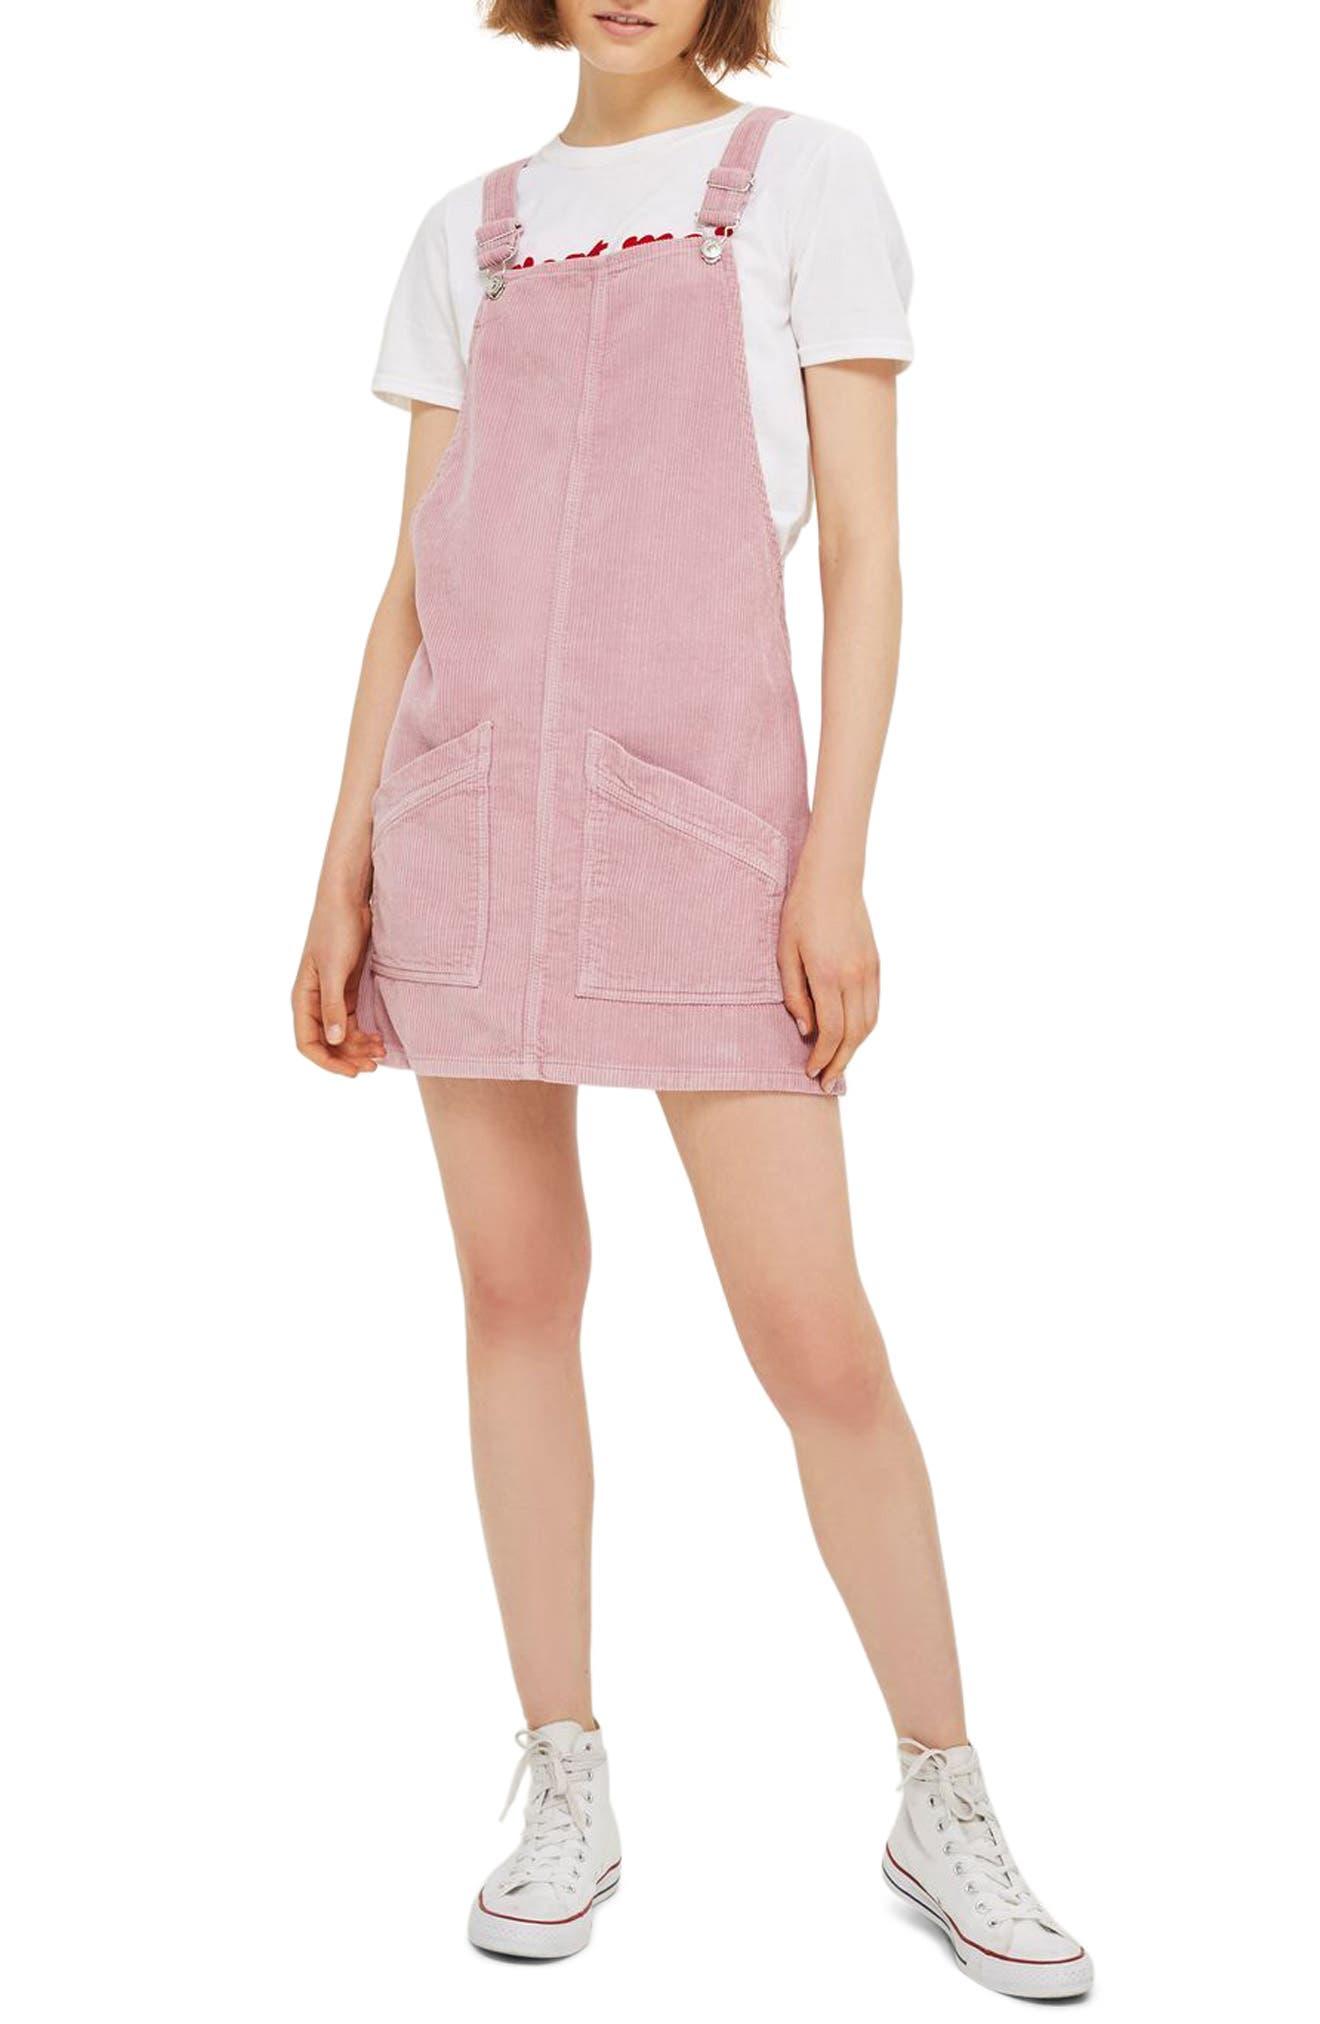 Topshop Corduroy Pinafore Dress